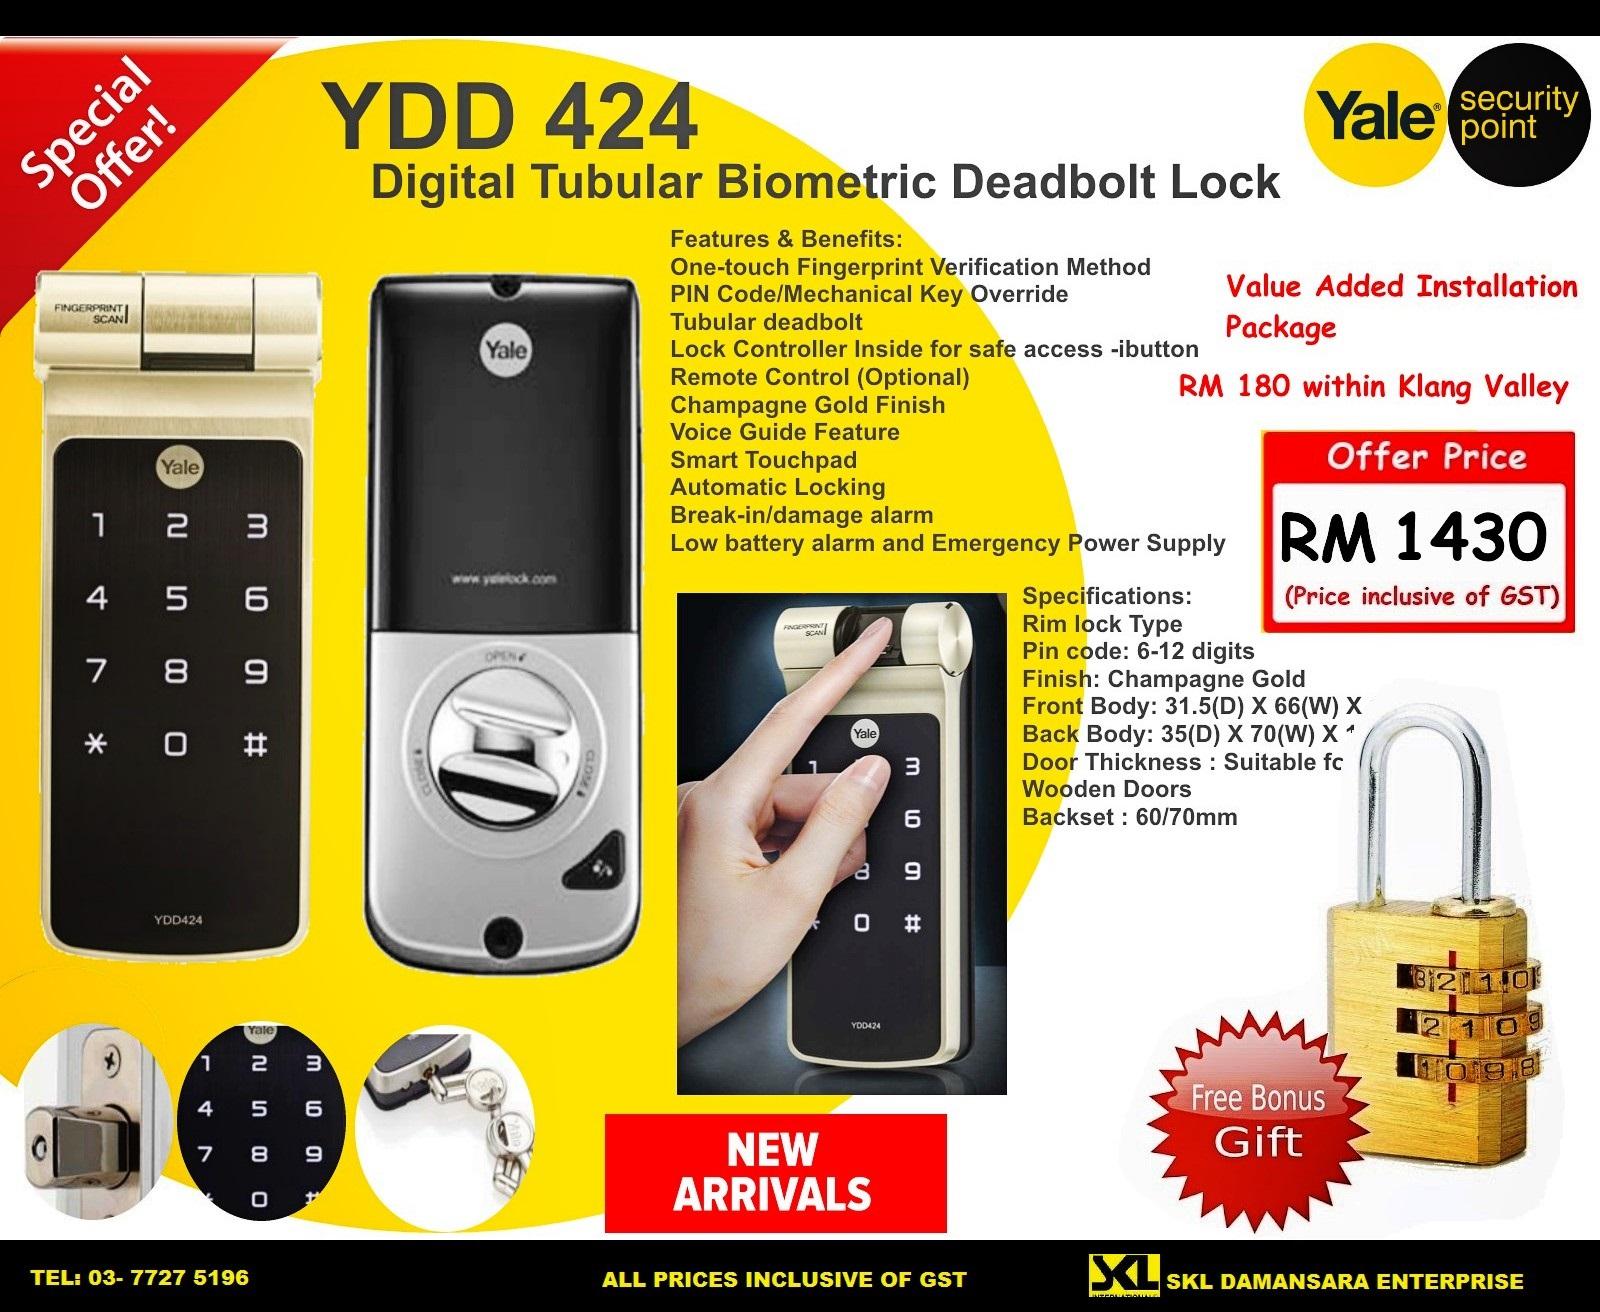 New Arrival 2016!! Yale YDD424 Biometric Digital Lock now on sales